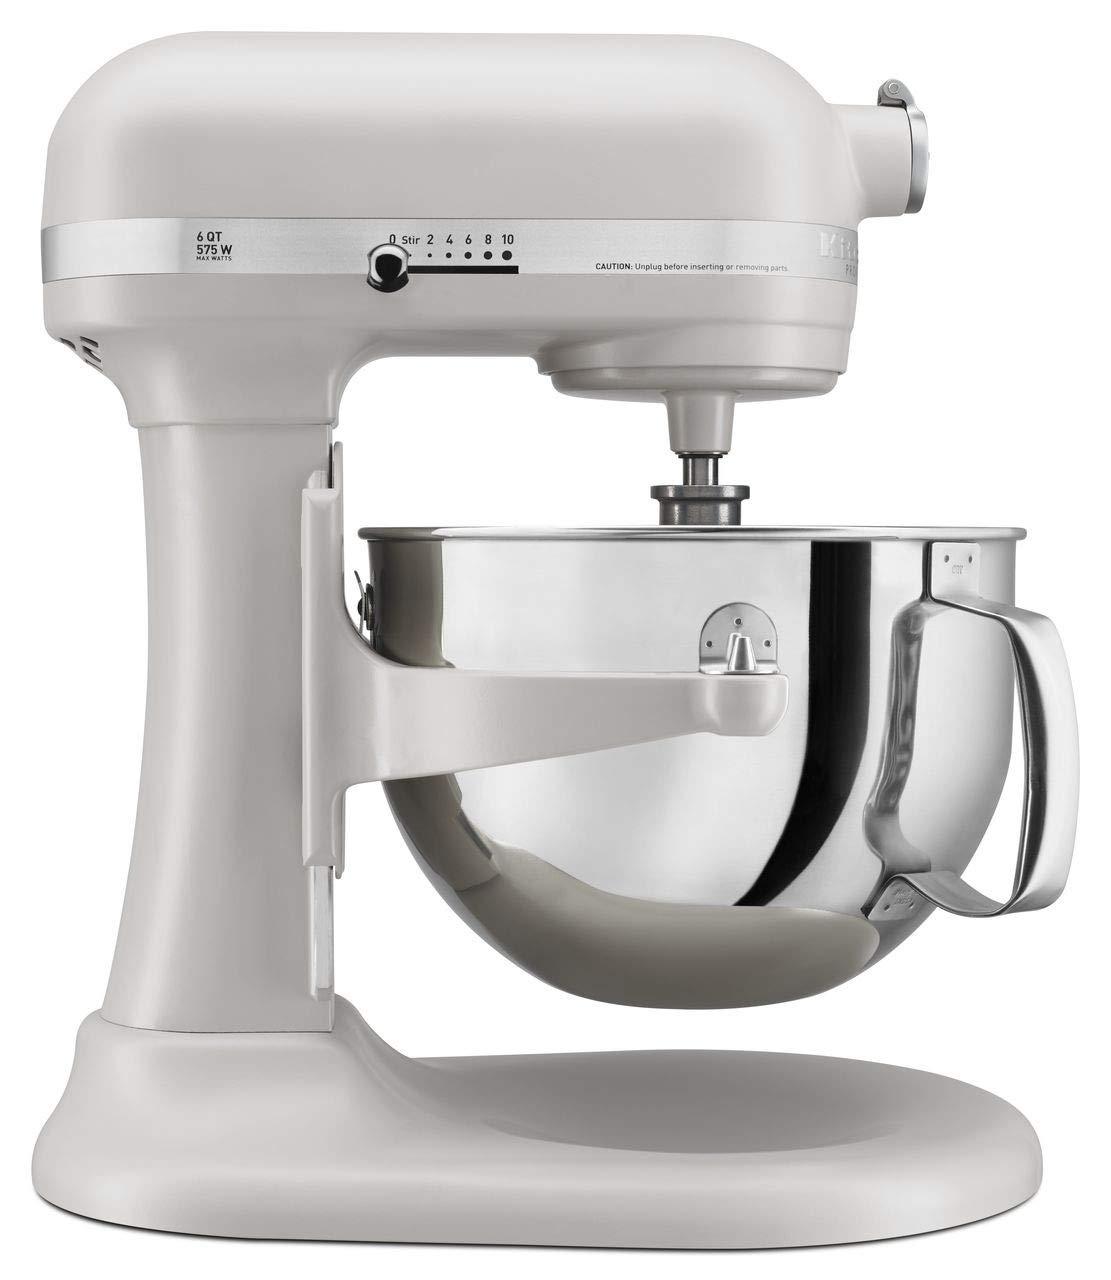 KitchenAid KP26M1XMH 6 Qt. Professional 600 Series Bowl-Lift Stand Mixer - Milkshake Color